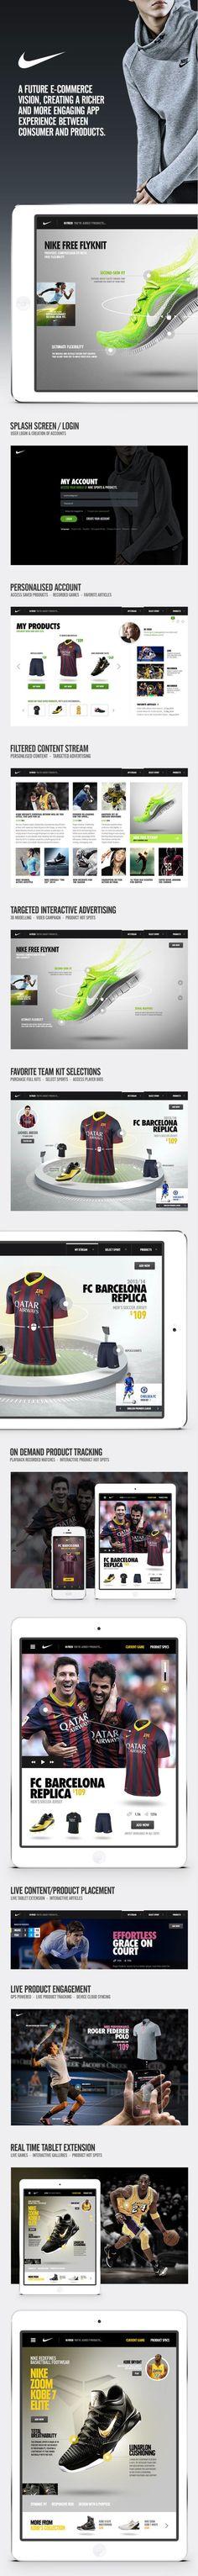 Nike Vision #mobile #nike #ux #ui #digital